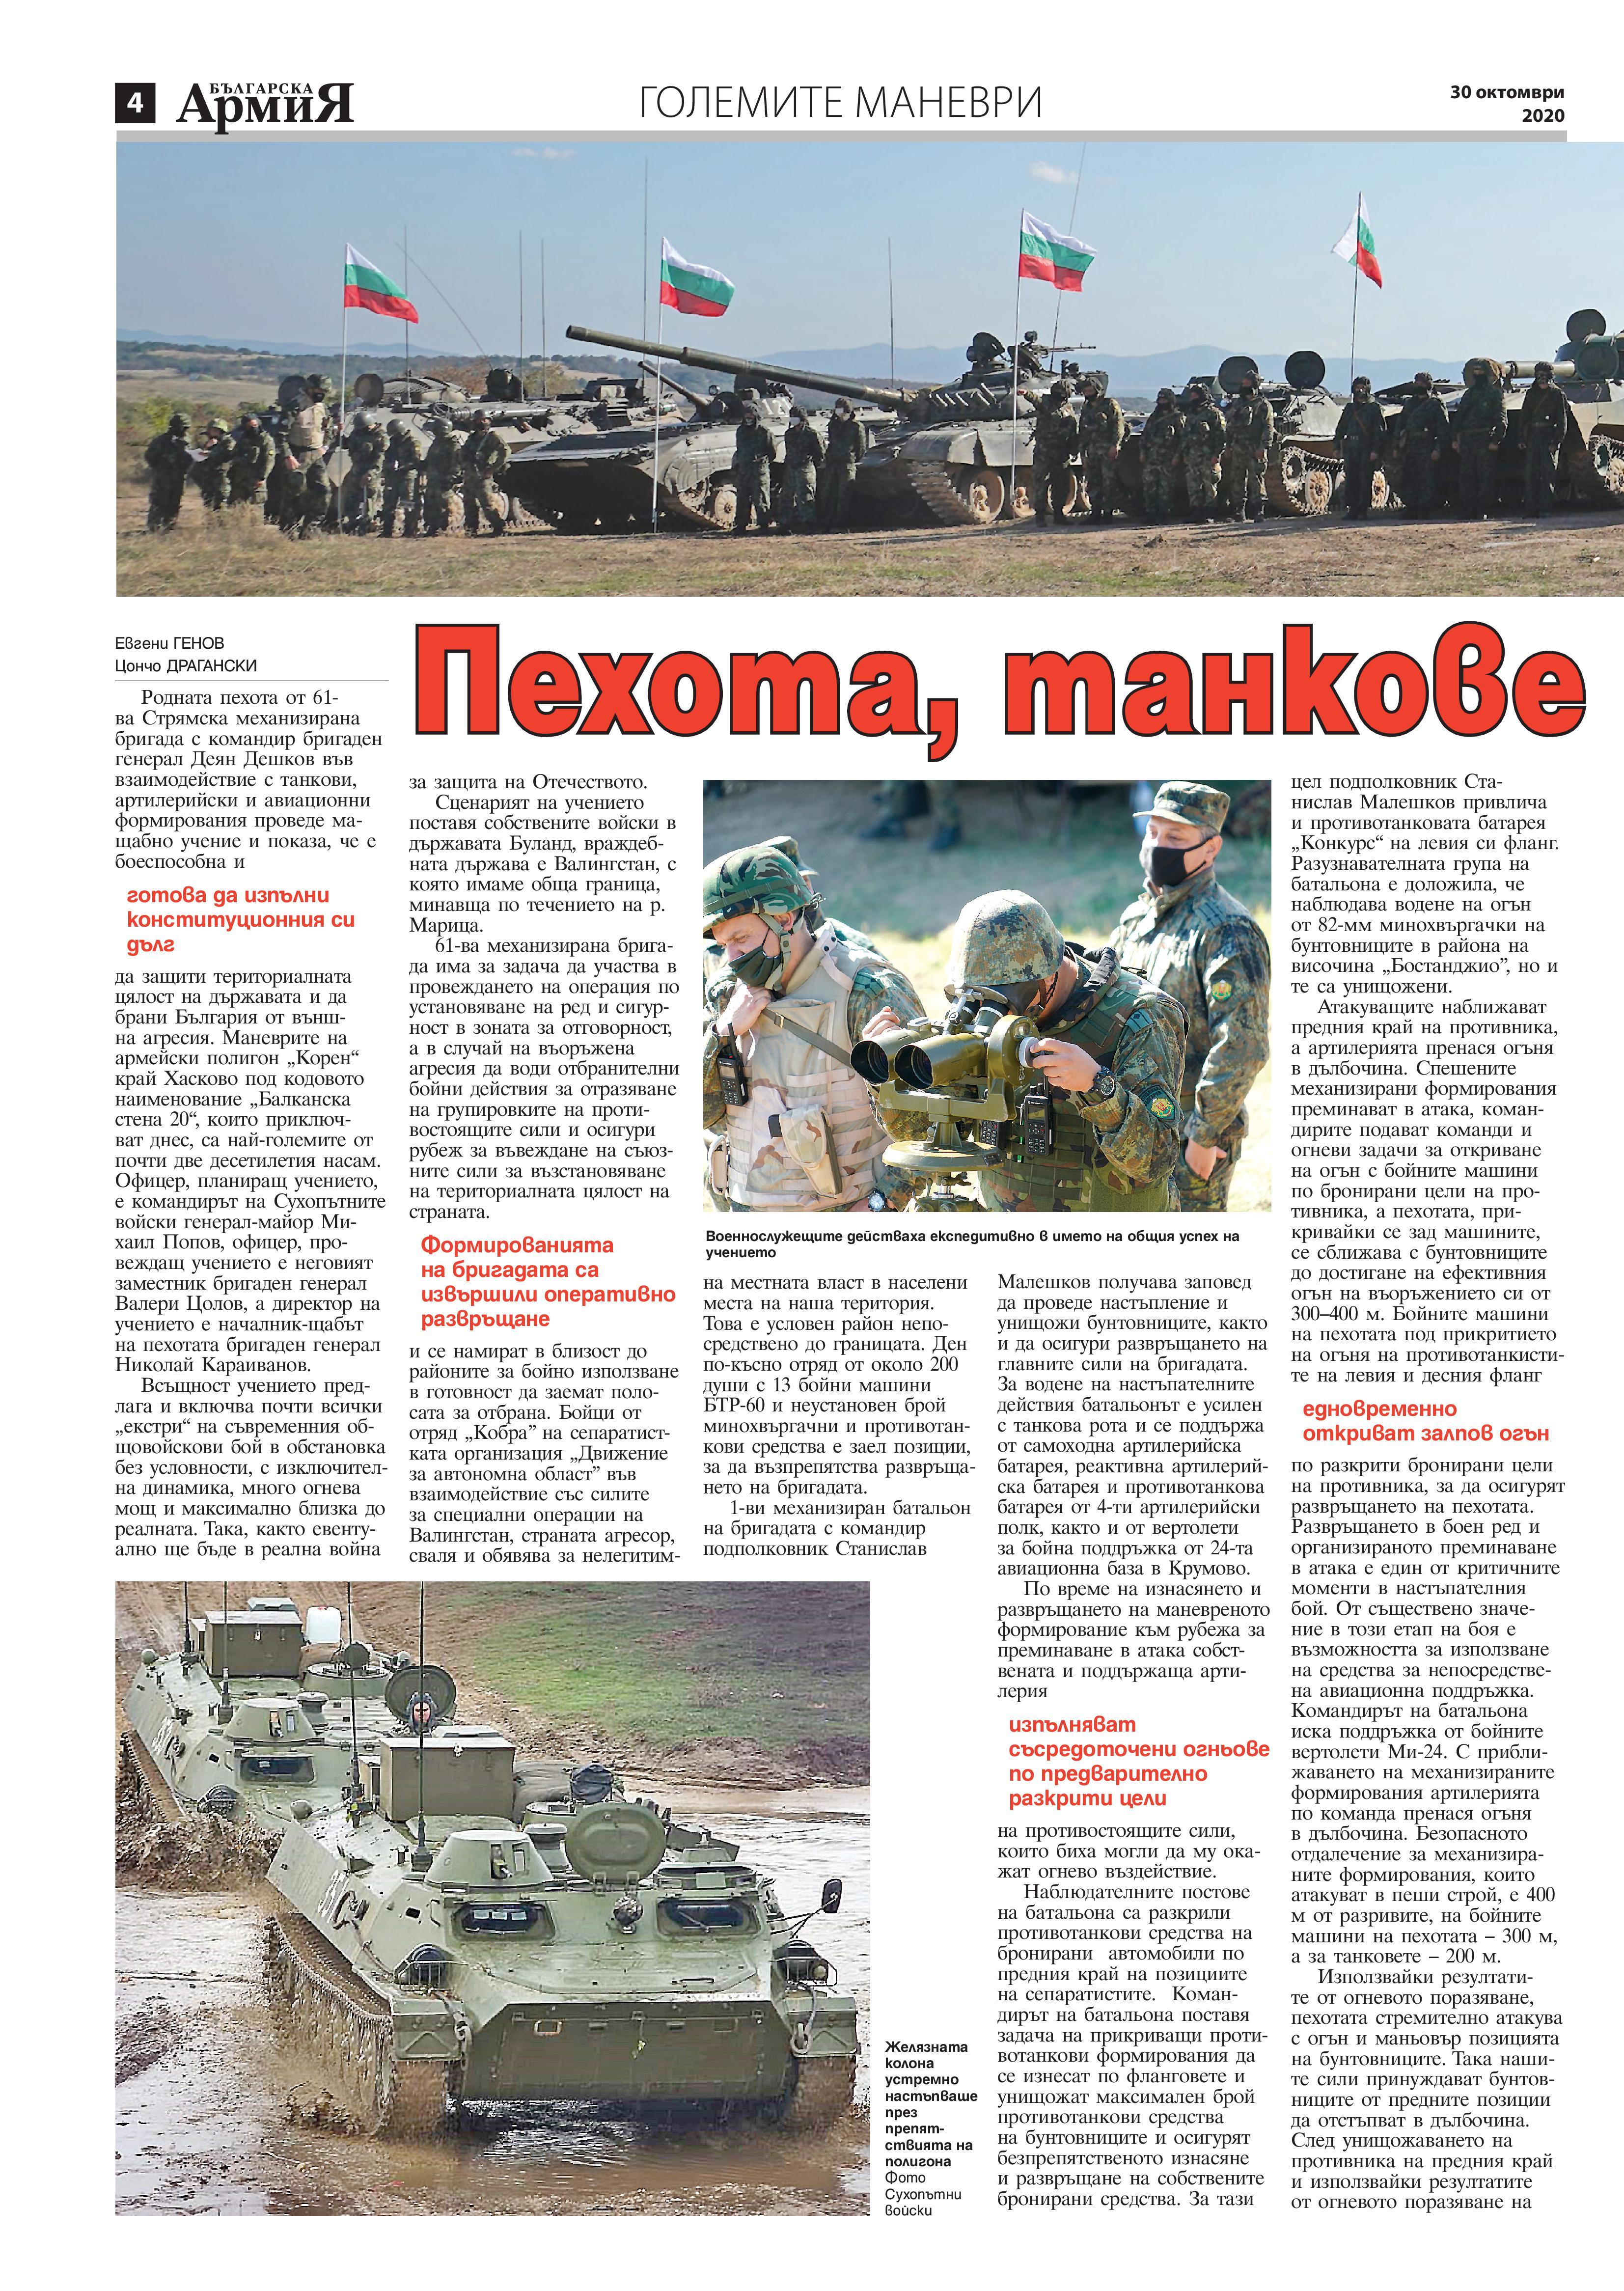 https://armymedia.bg/wp-content/uploads/2015/06/04-45.jpg